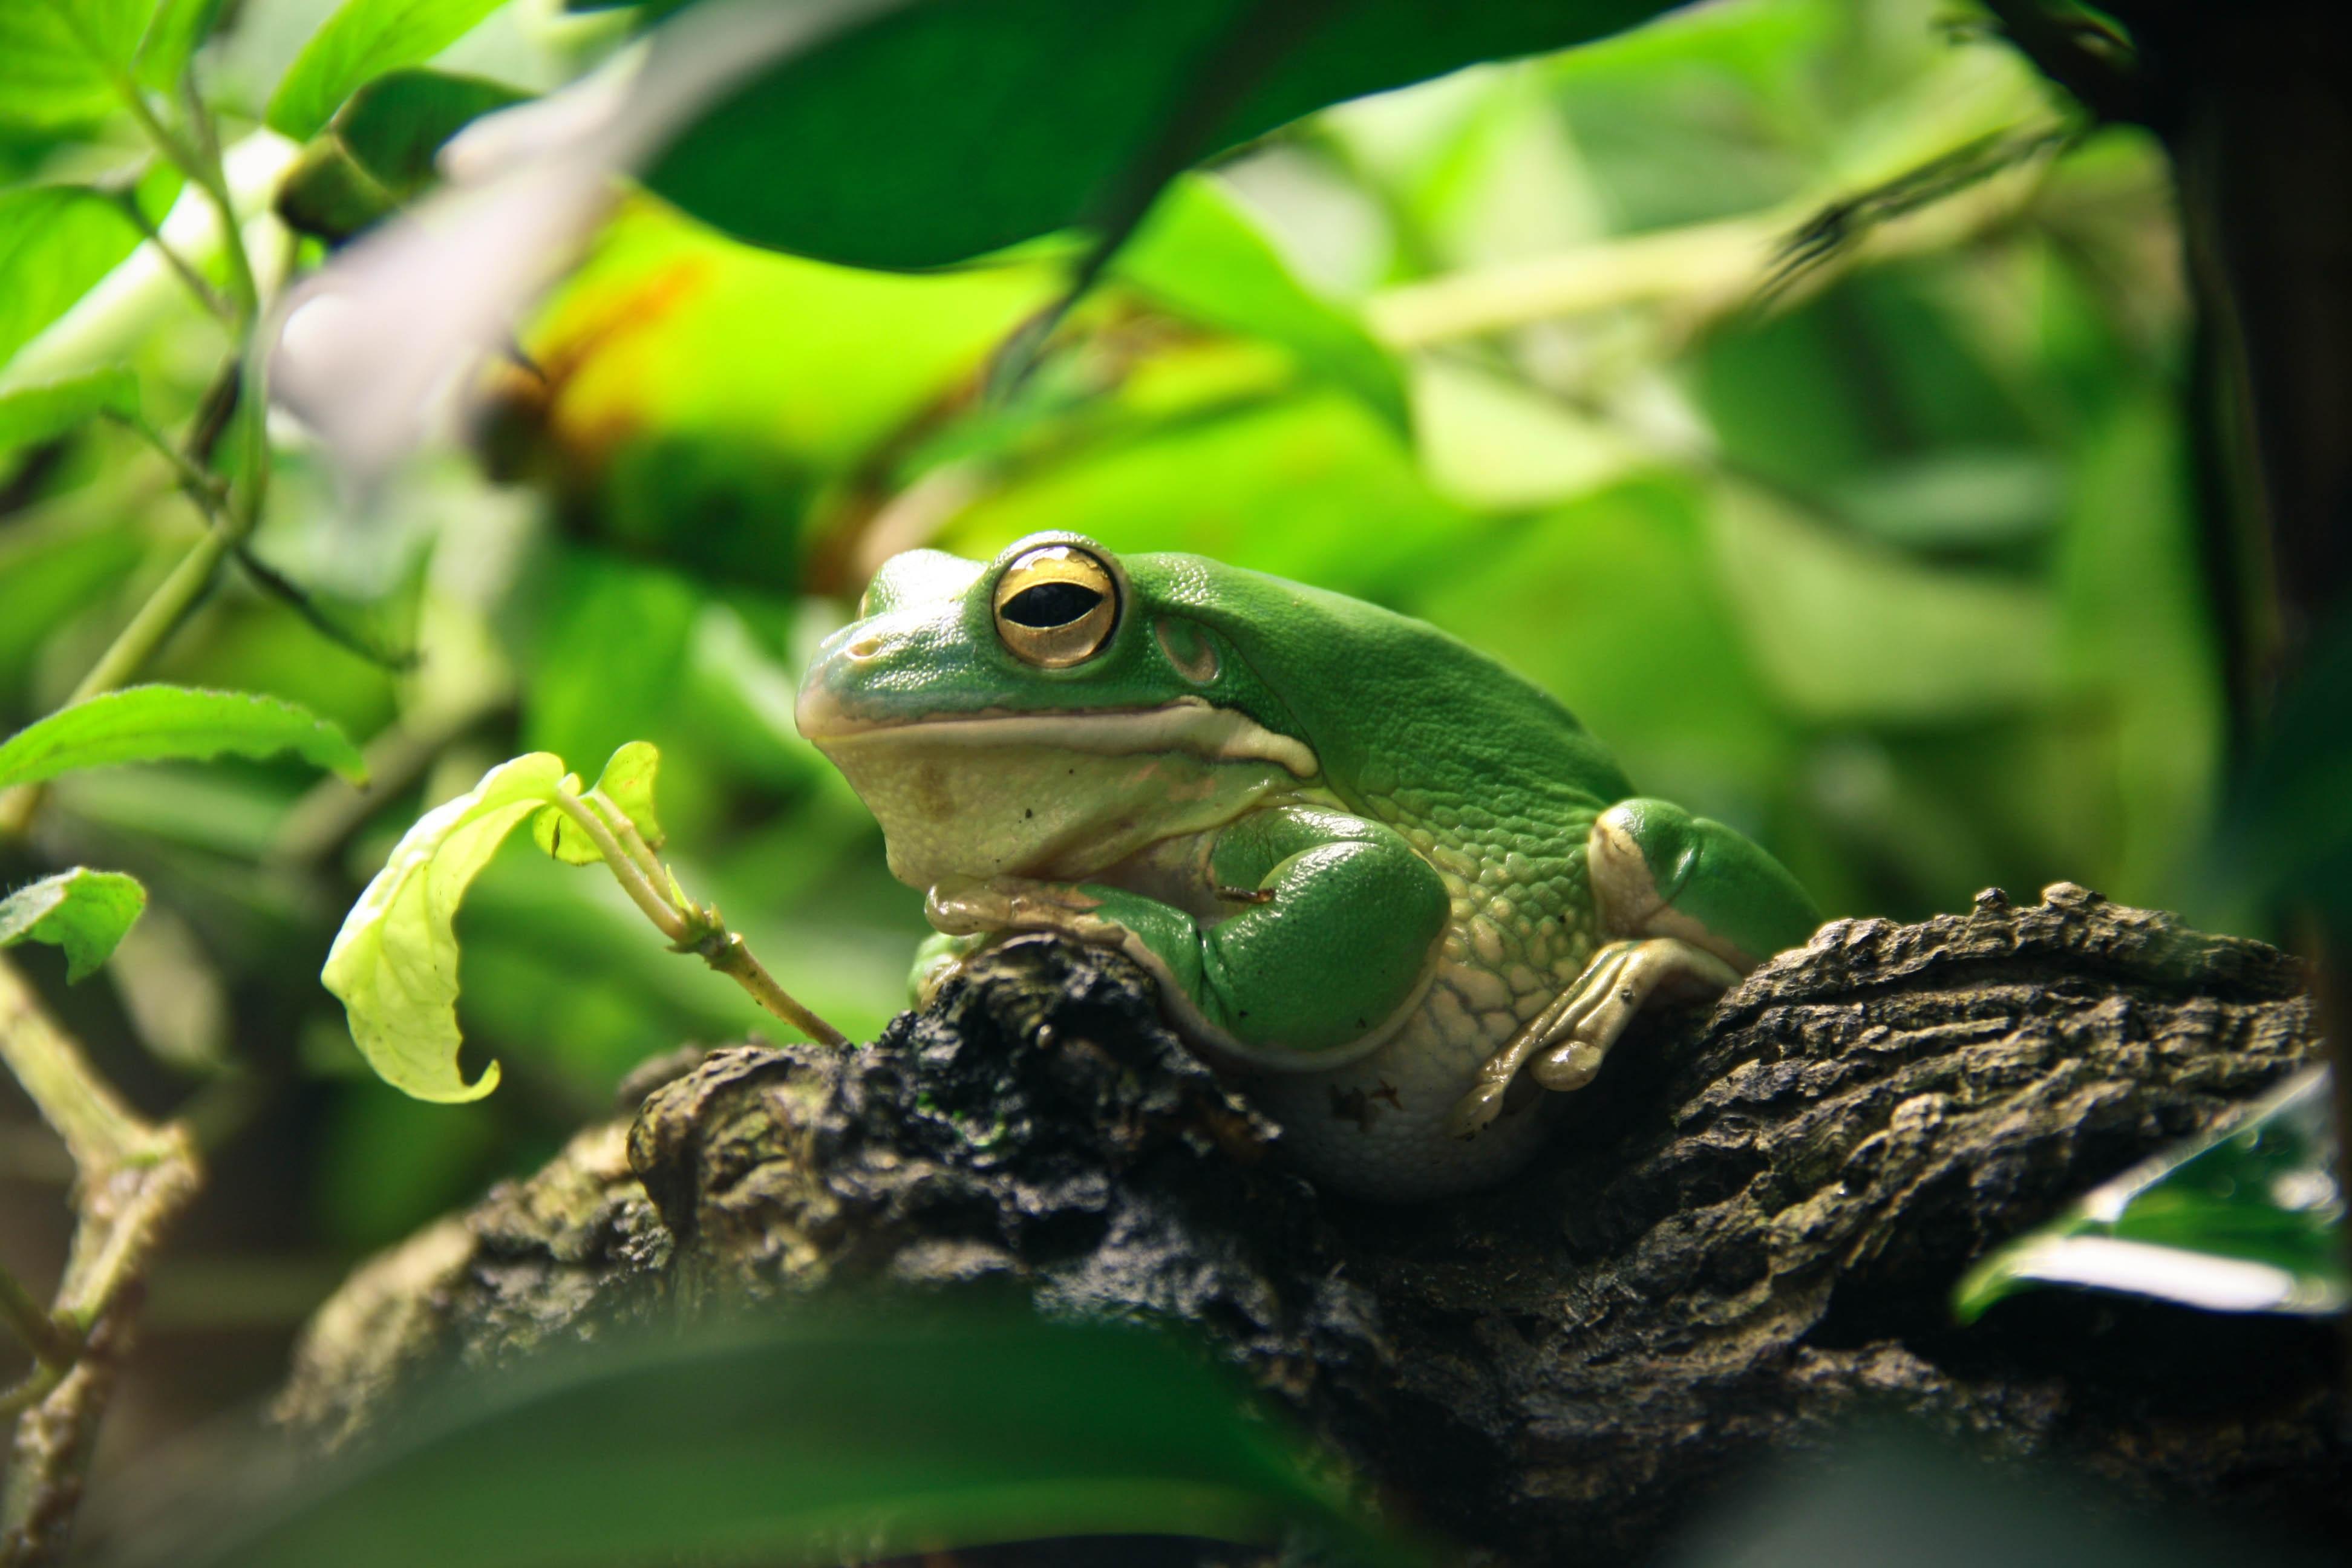 картинки красивые с лягушками реабилитации